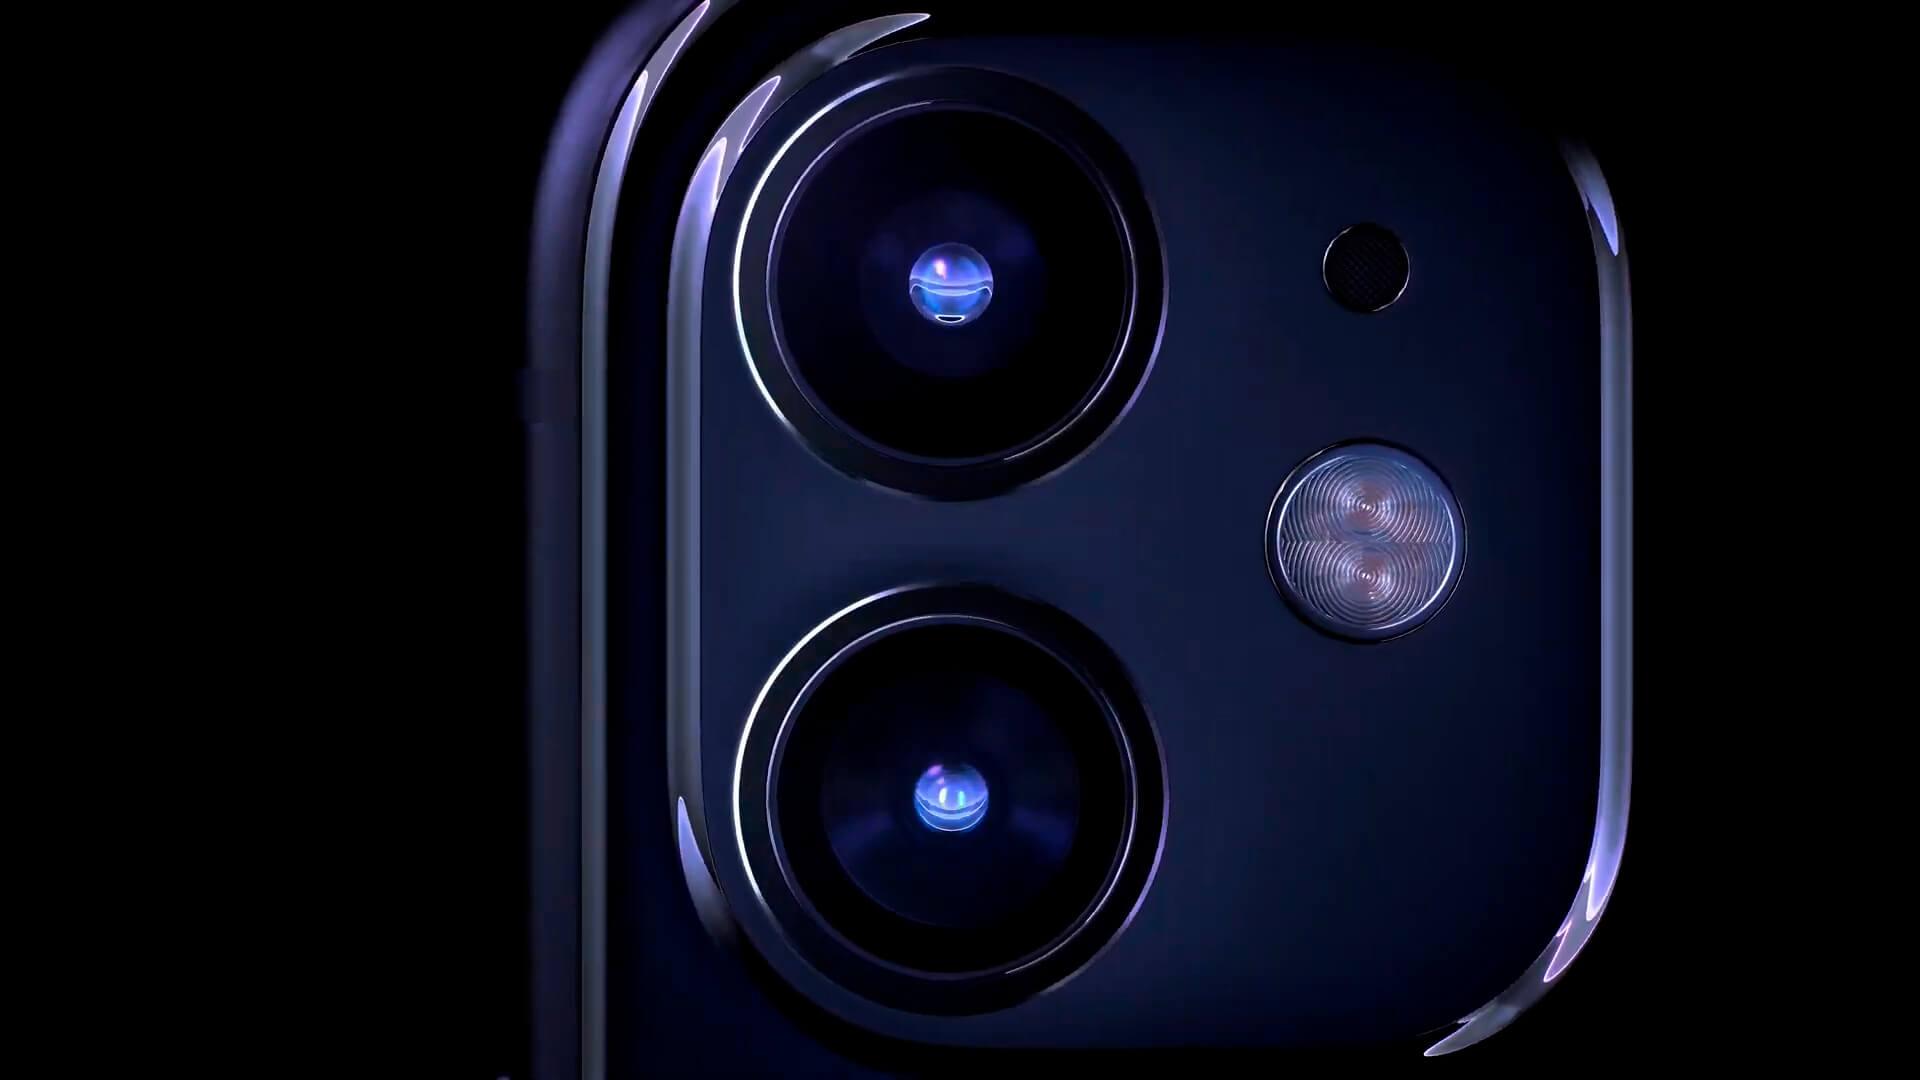 Android'de iPhone 11 ve iPhone 11 Pro'ya daha ucuz alternatifler 1